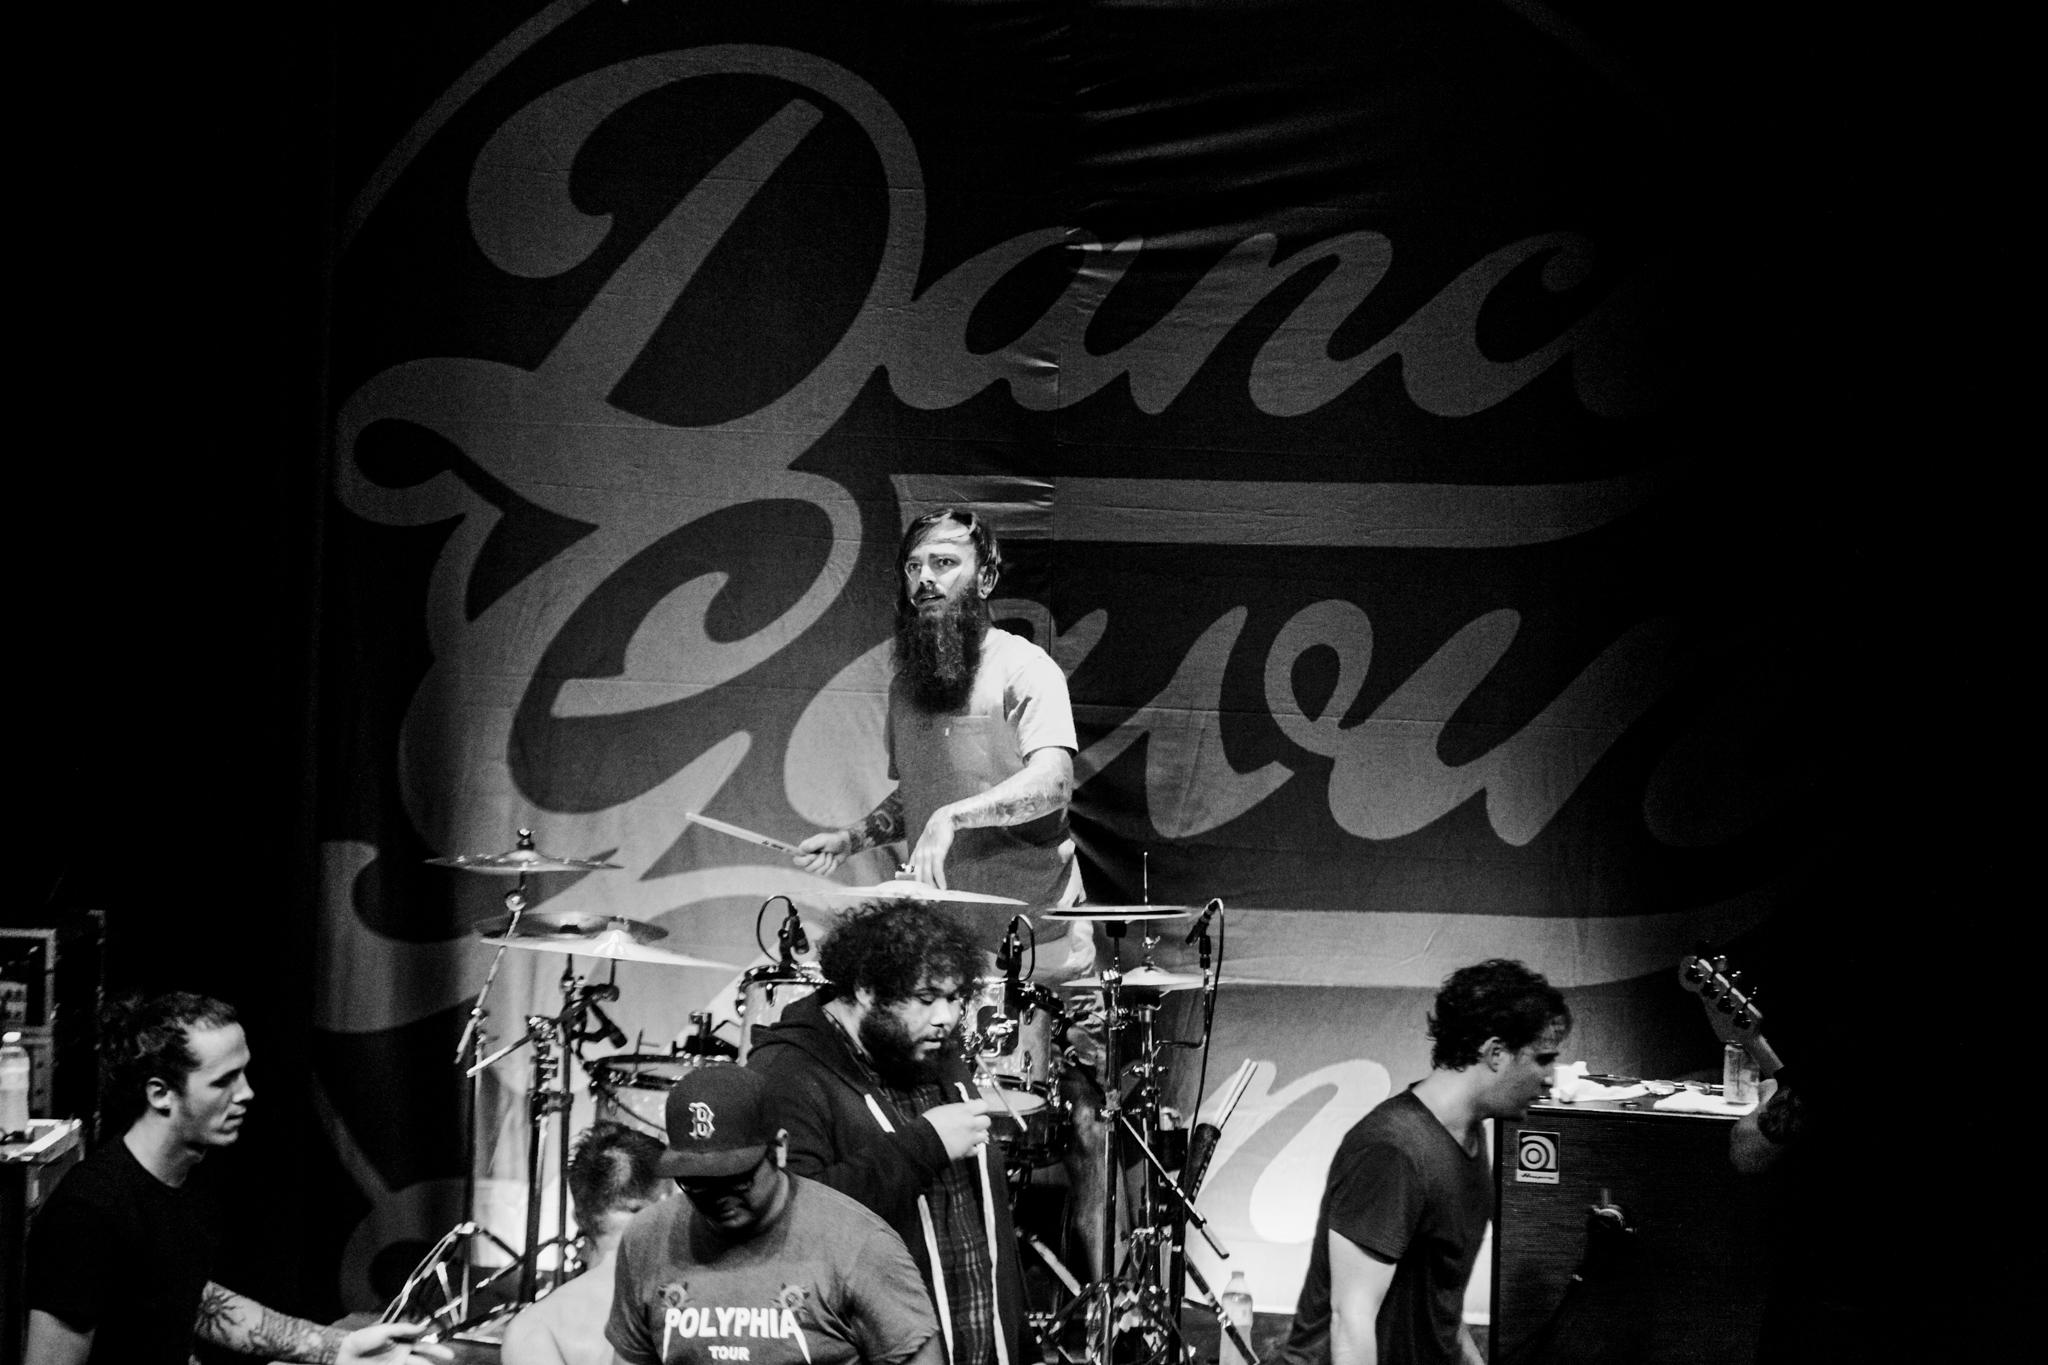 Lafferty Photo - Dance Gavin Dance 03.08.17-8907.jpg